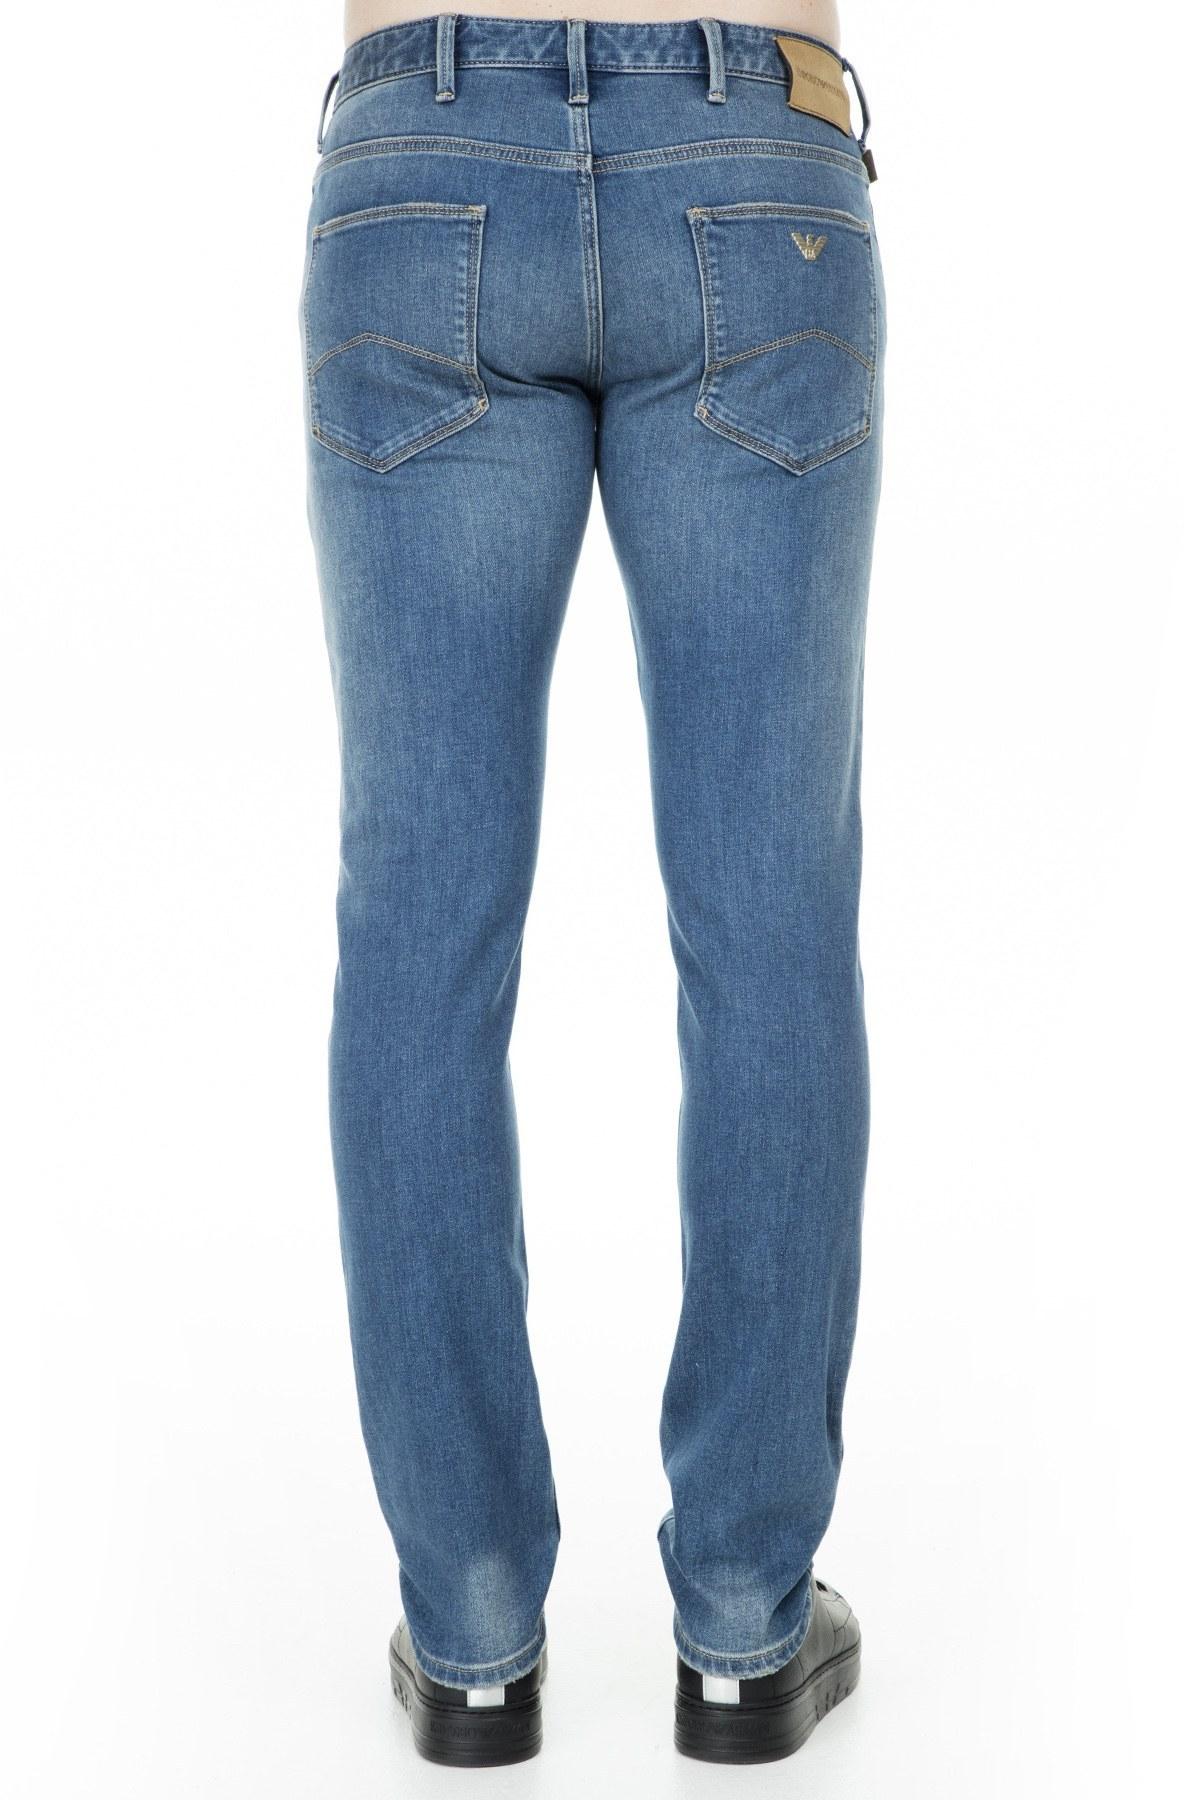 Emporio Armani J06 Jeans Erkek Kot Pantolon S 3G1J06 1DLRZ 942 KOYU MAVİ